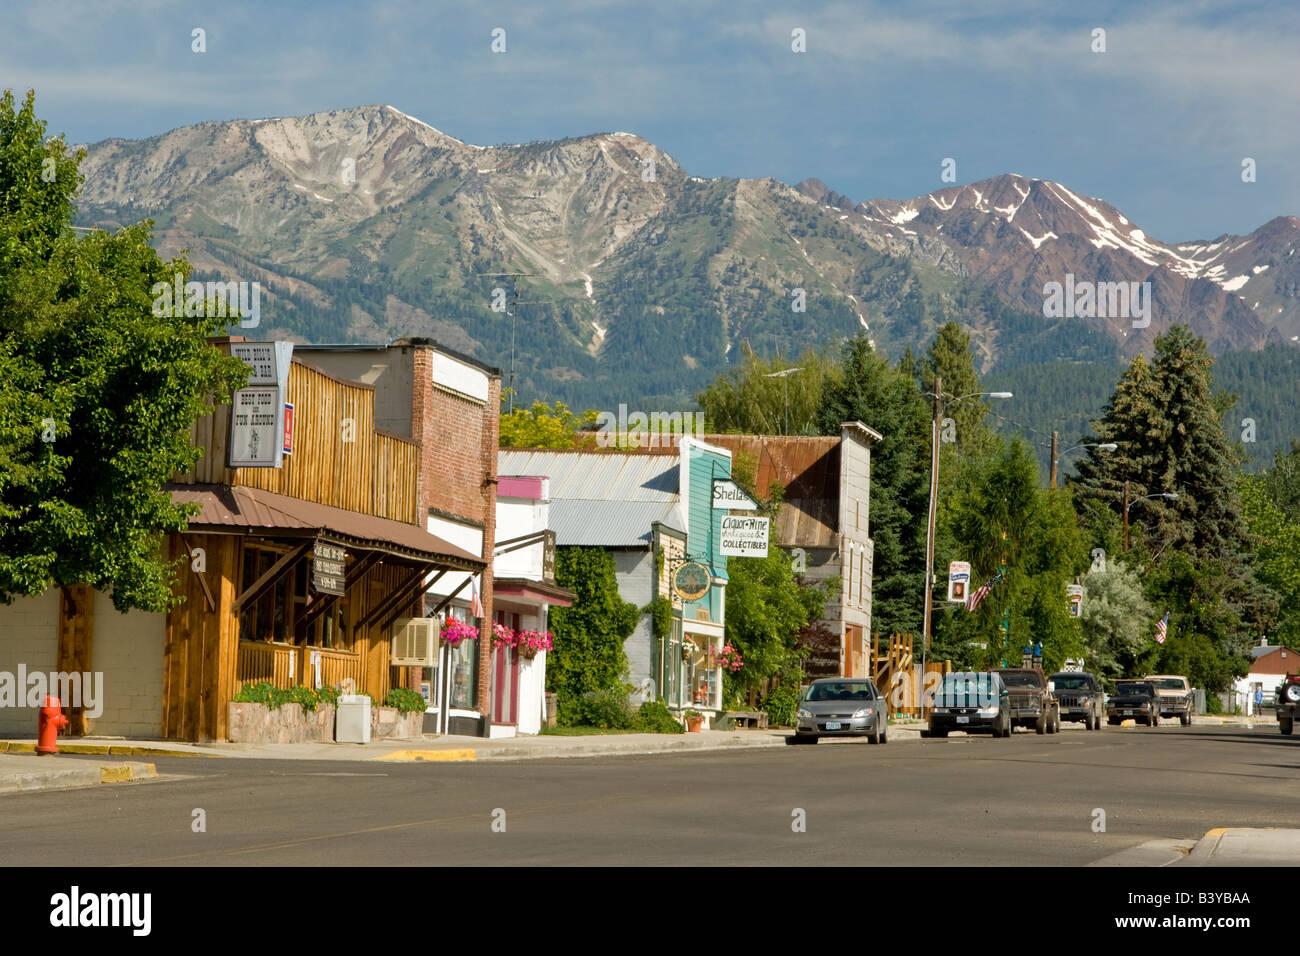 Main street with Wallow Mountains Halfway Oregon - Stock Image